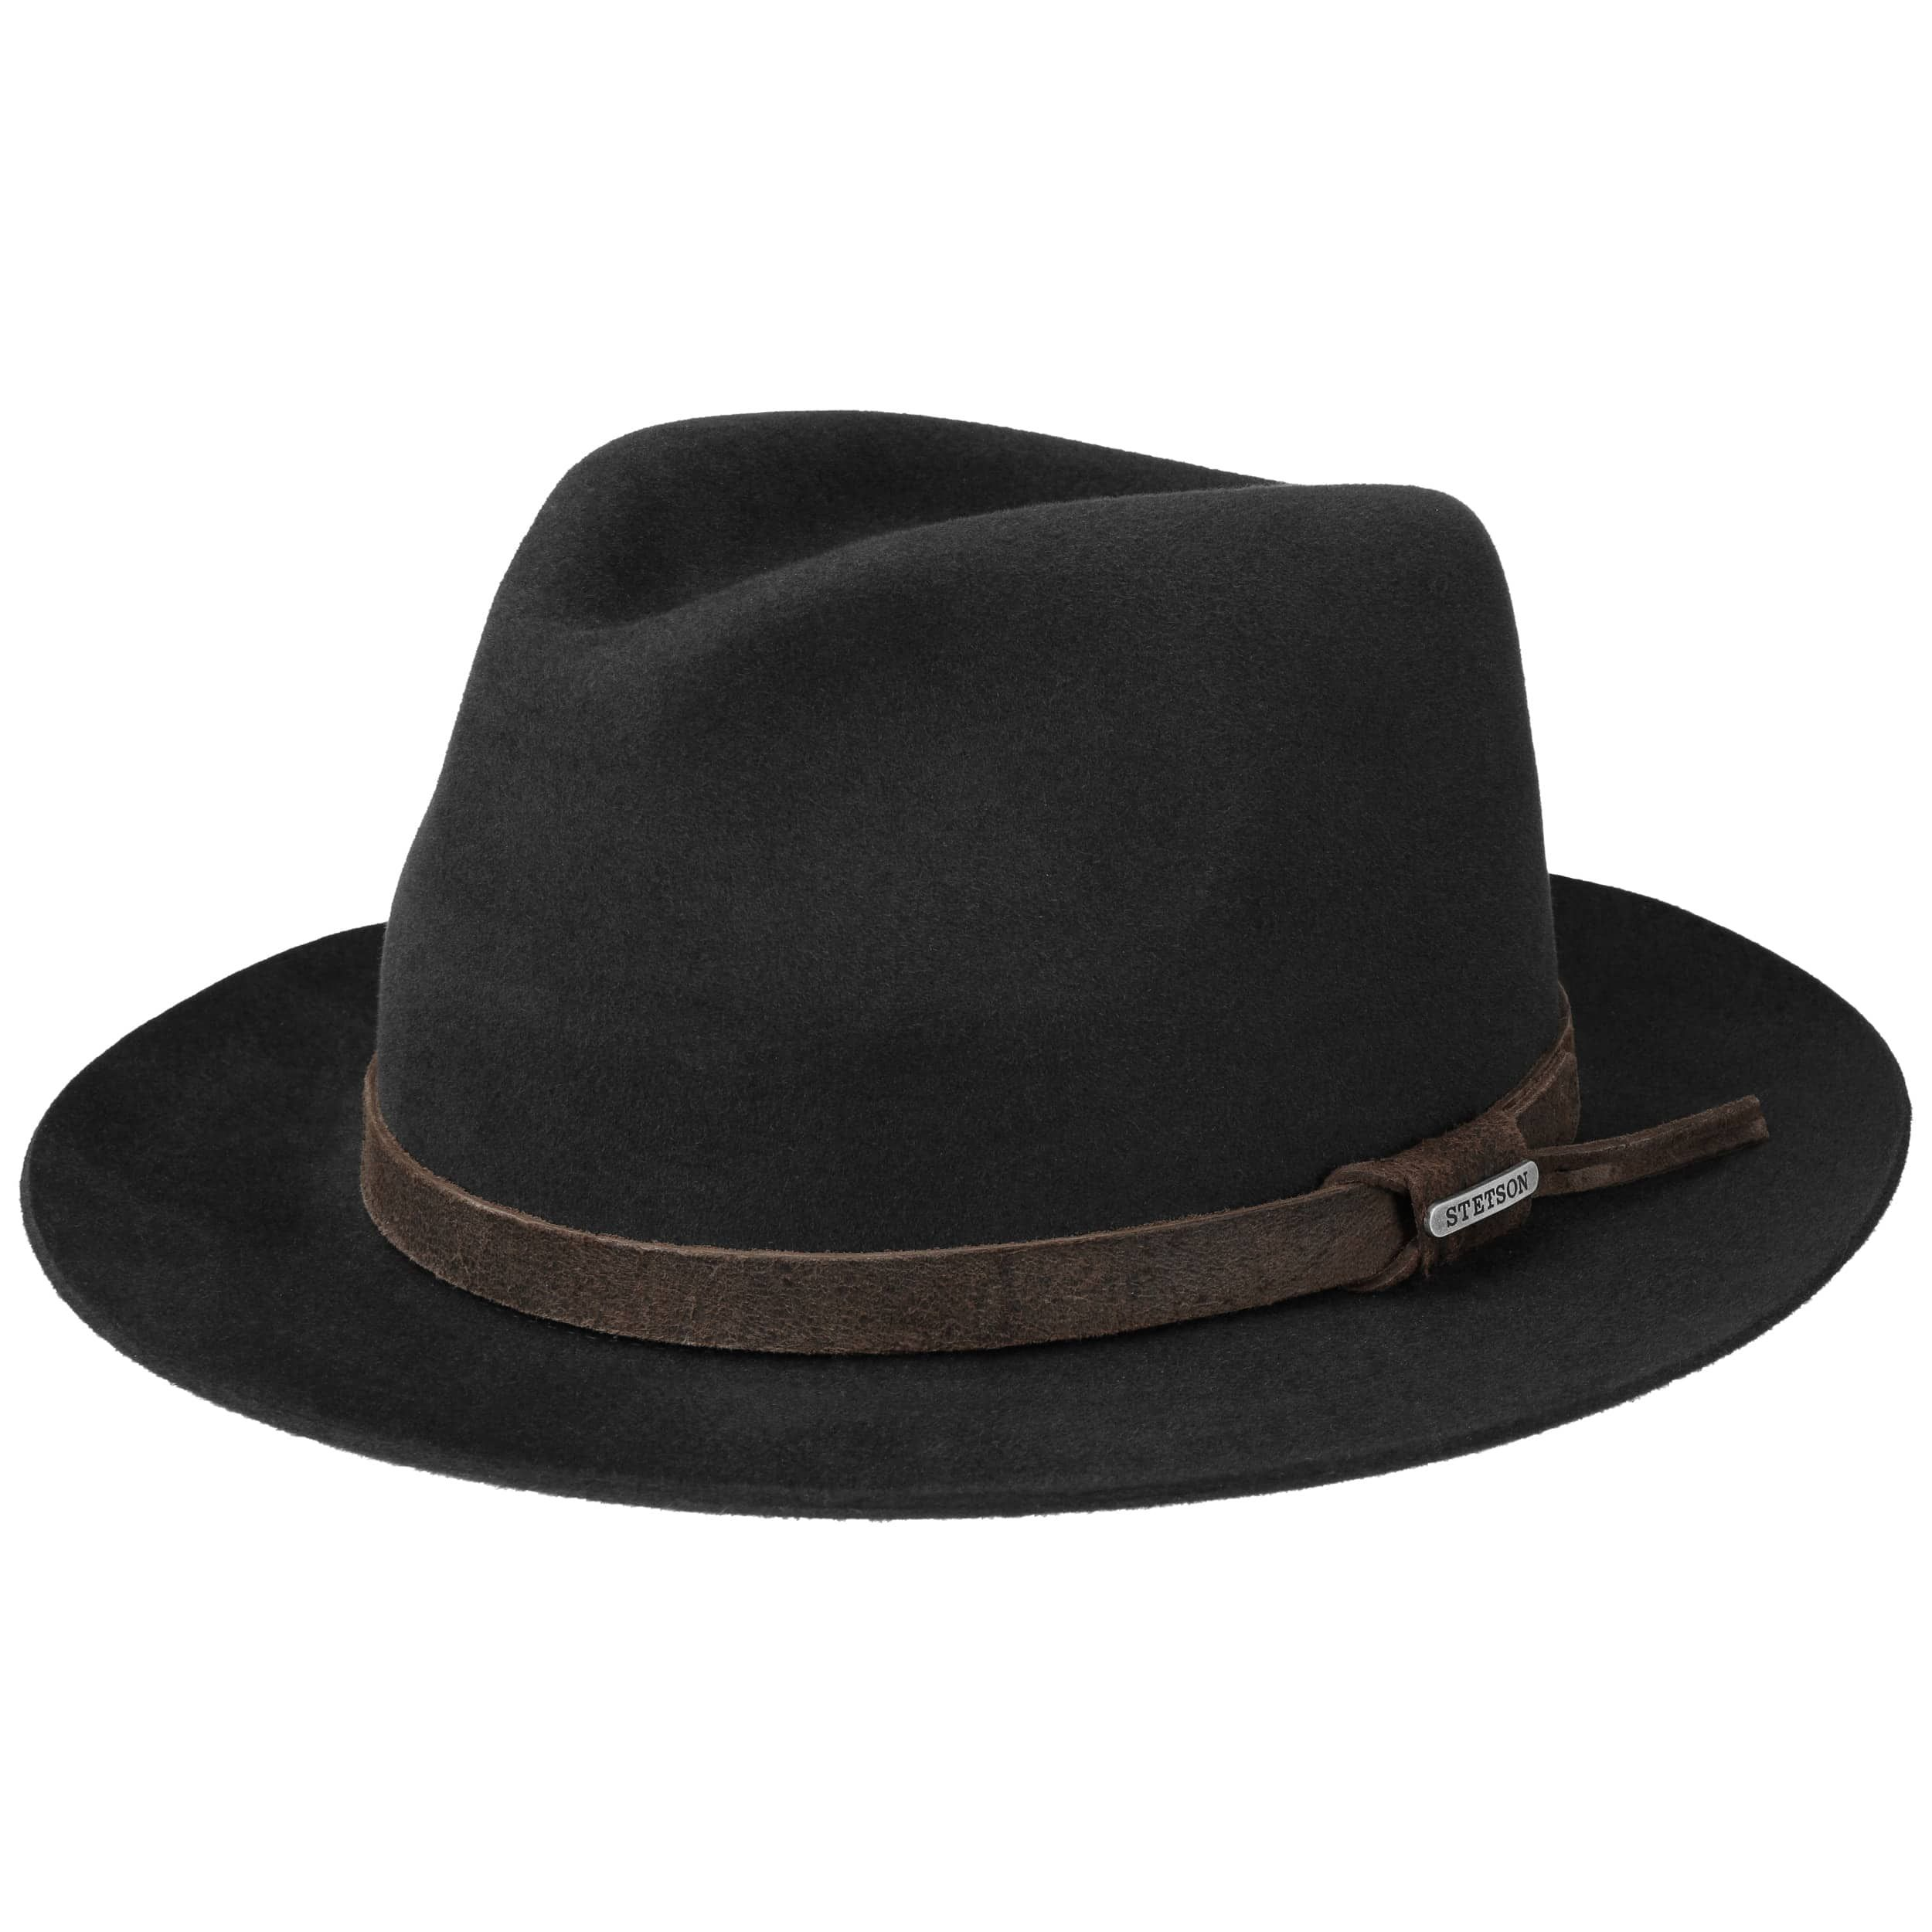 Travel Hat XL Wide Brim Sun Protection Smart Sun Hat Fedora 100/% Cotton Sun Hat